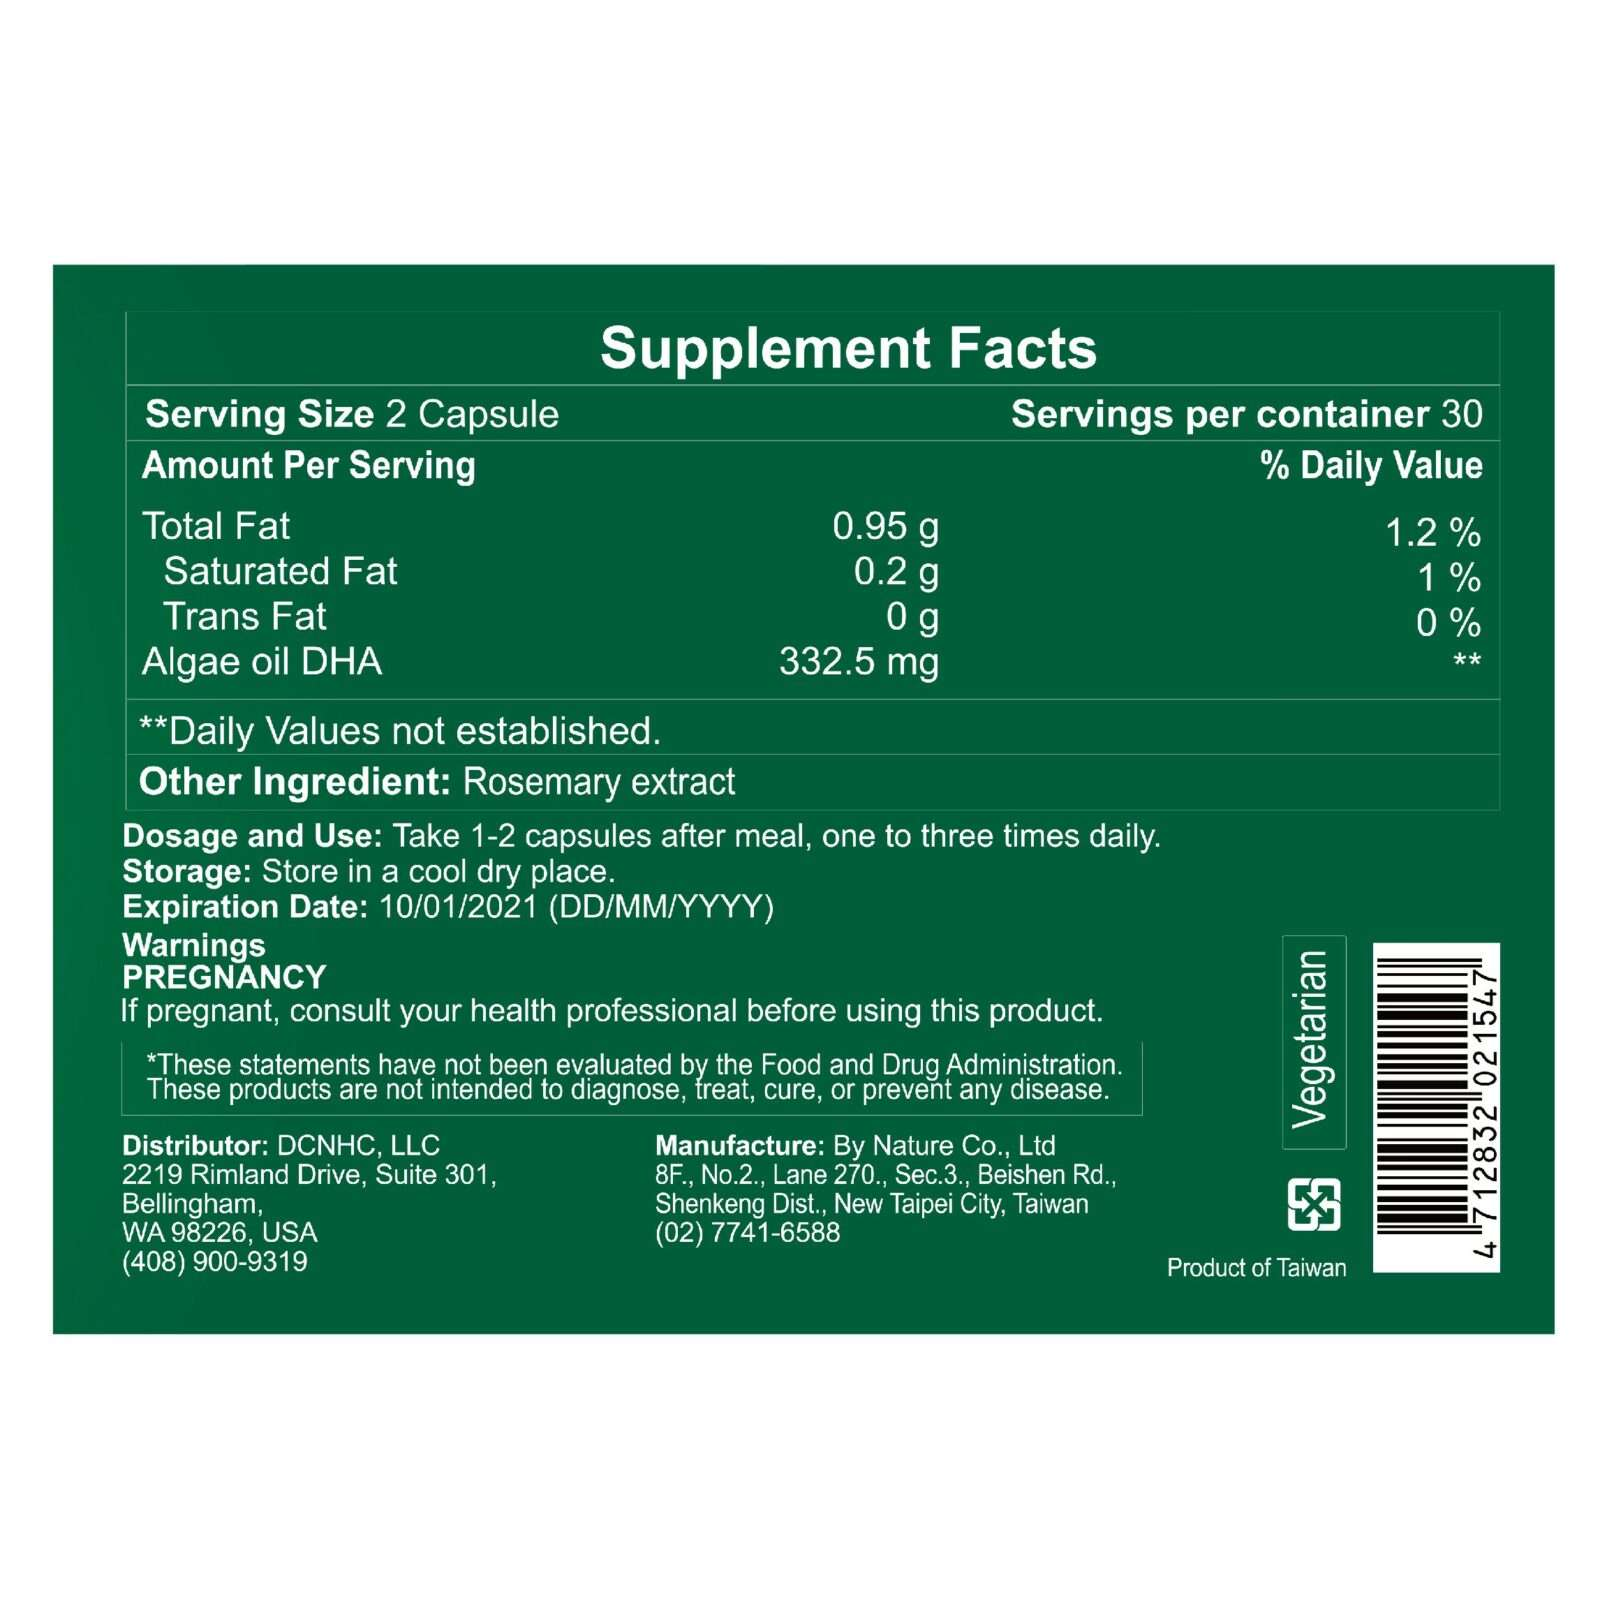 Vegan DHA / 微藻DHA膠囊 - DCNHC